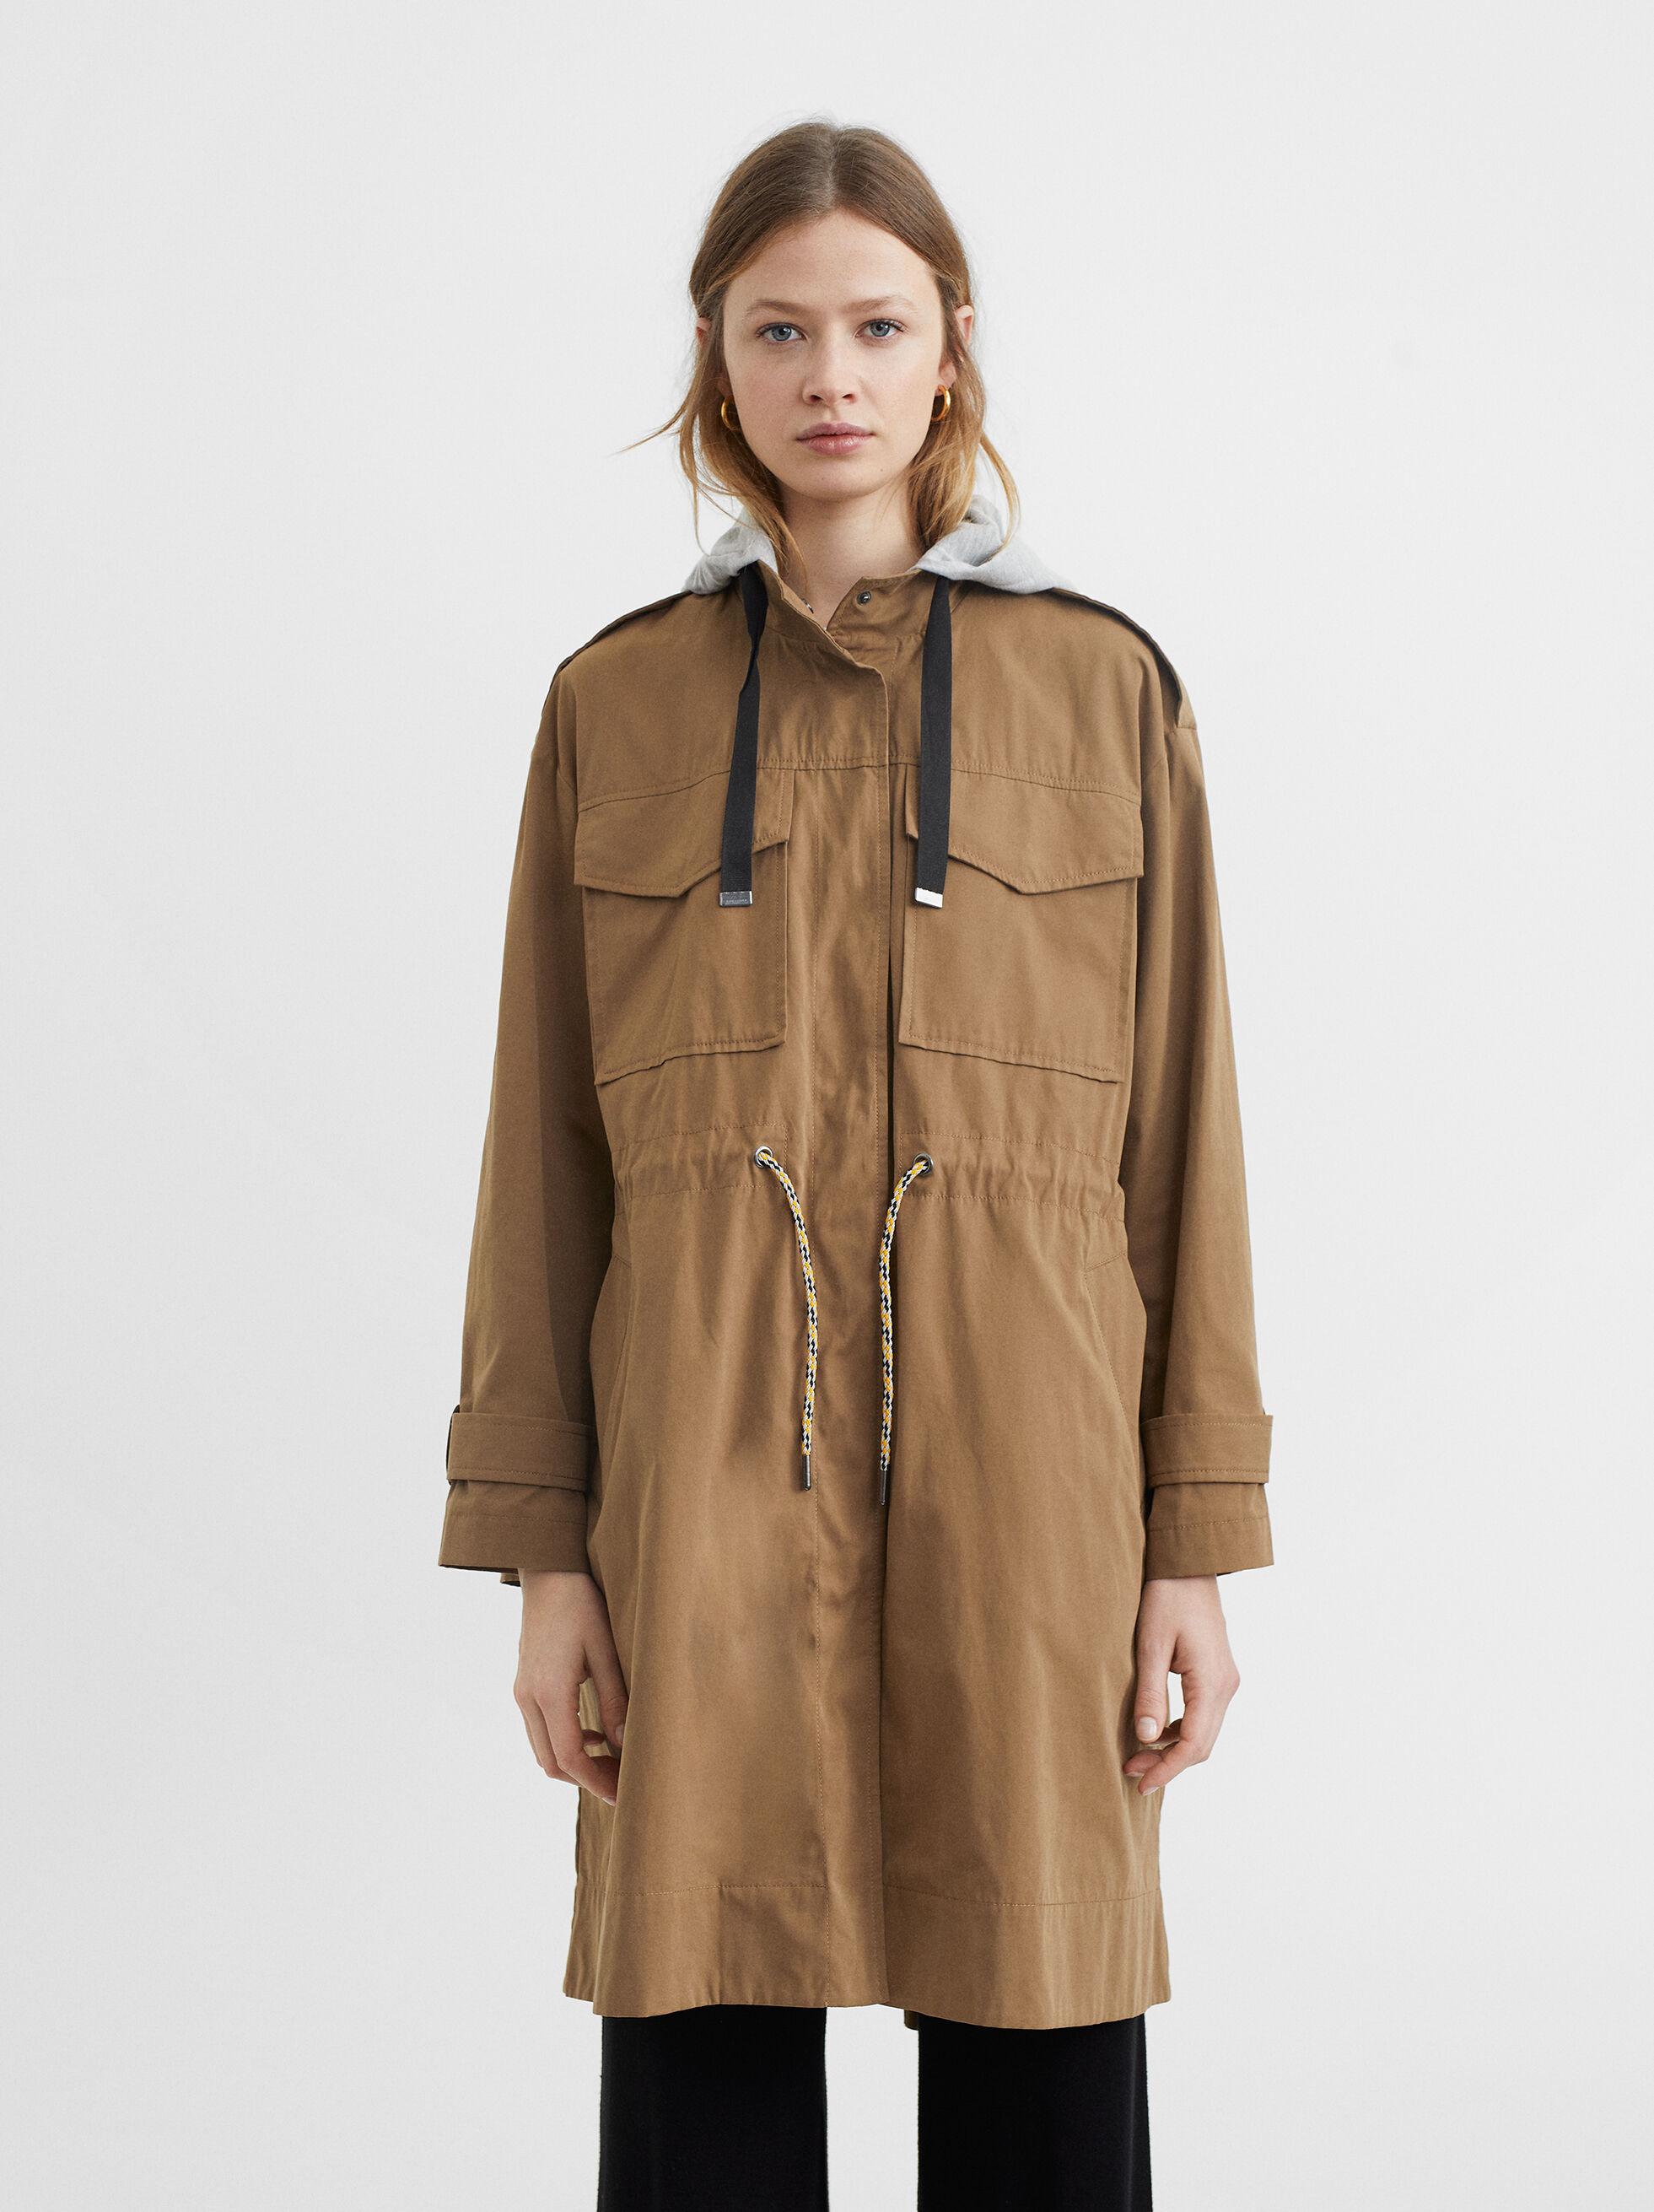 Jacket With Adjustable Waist, Brown, hi-res